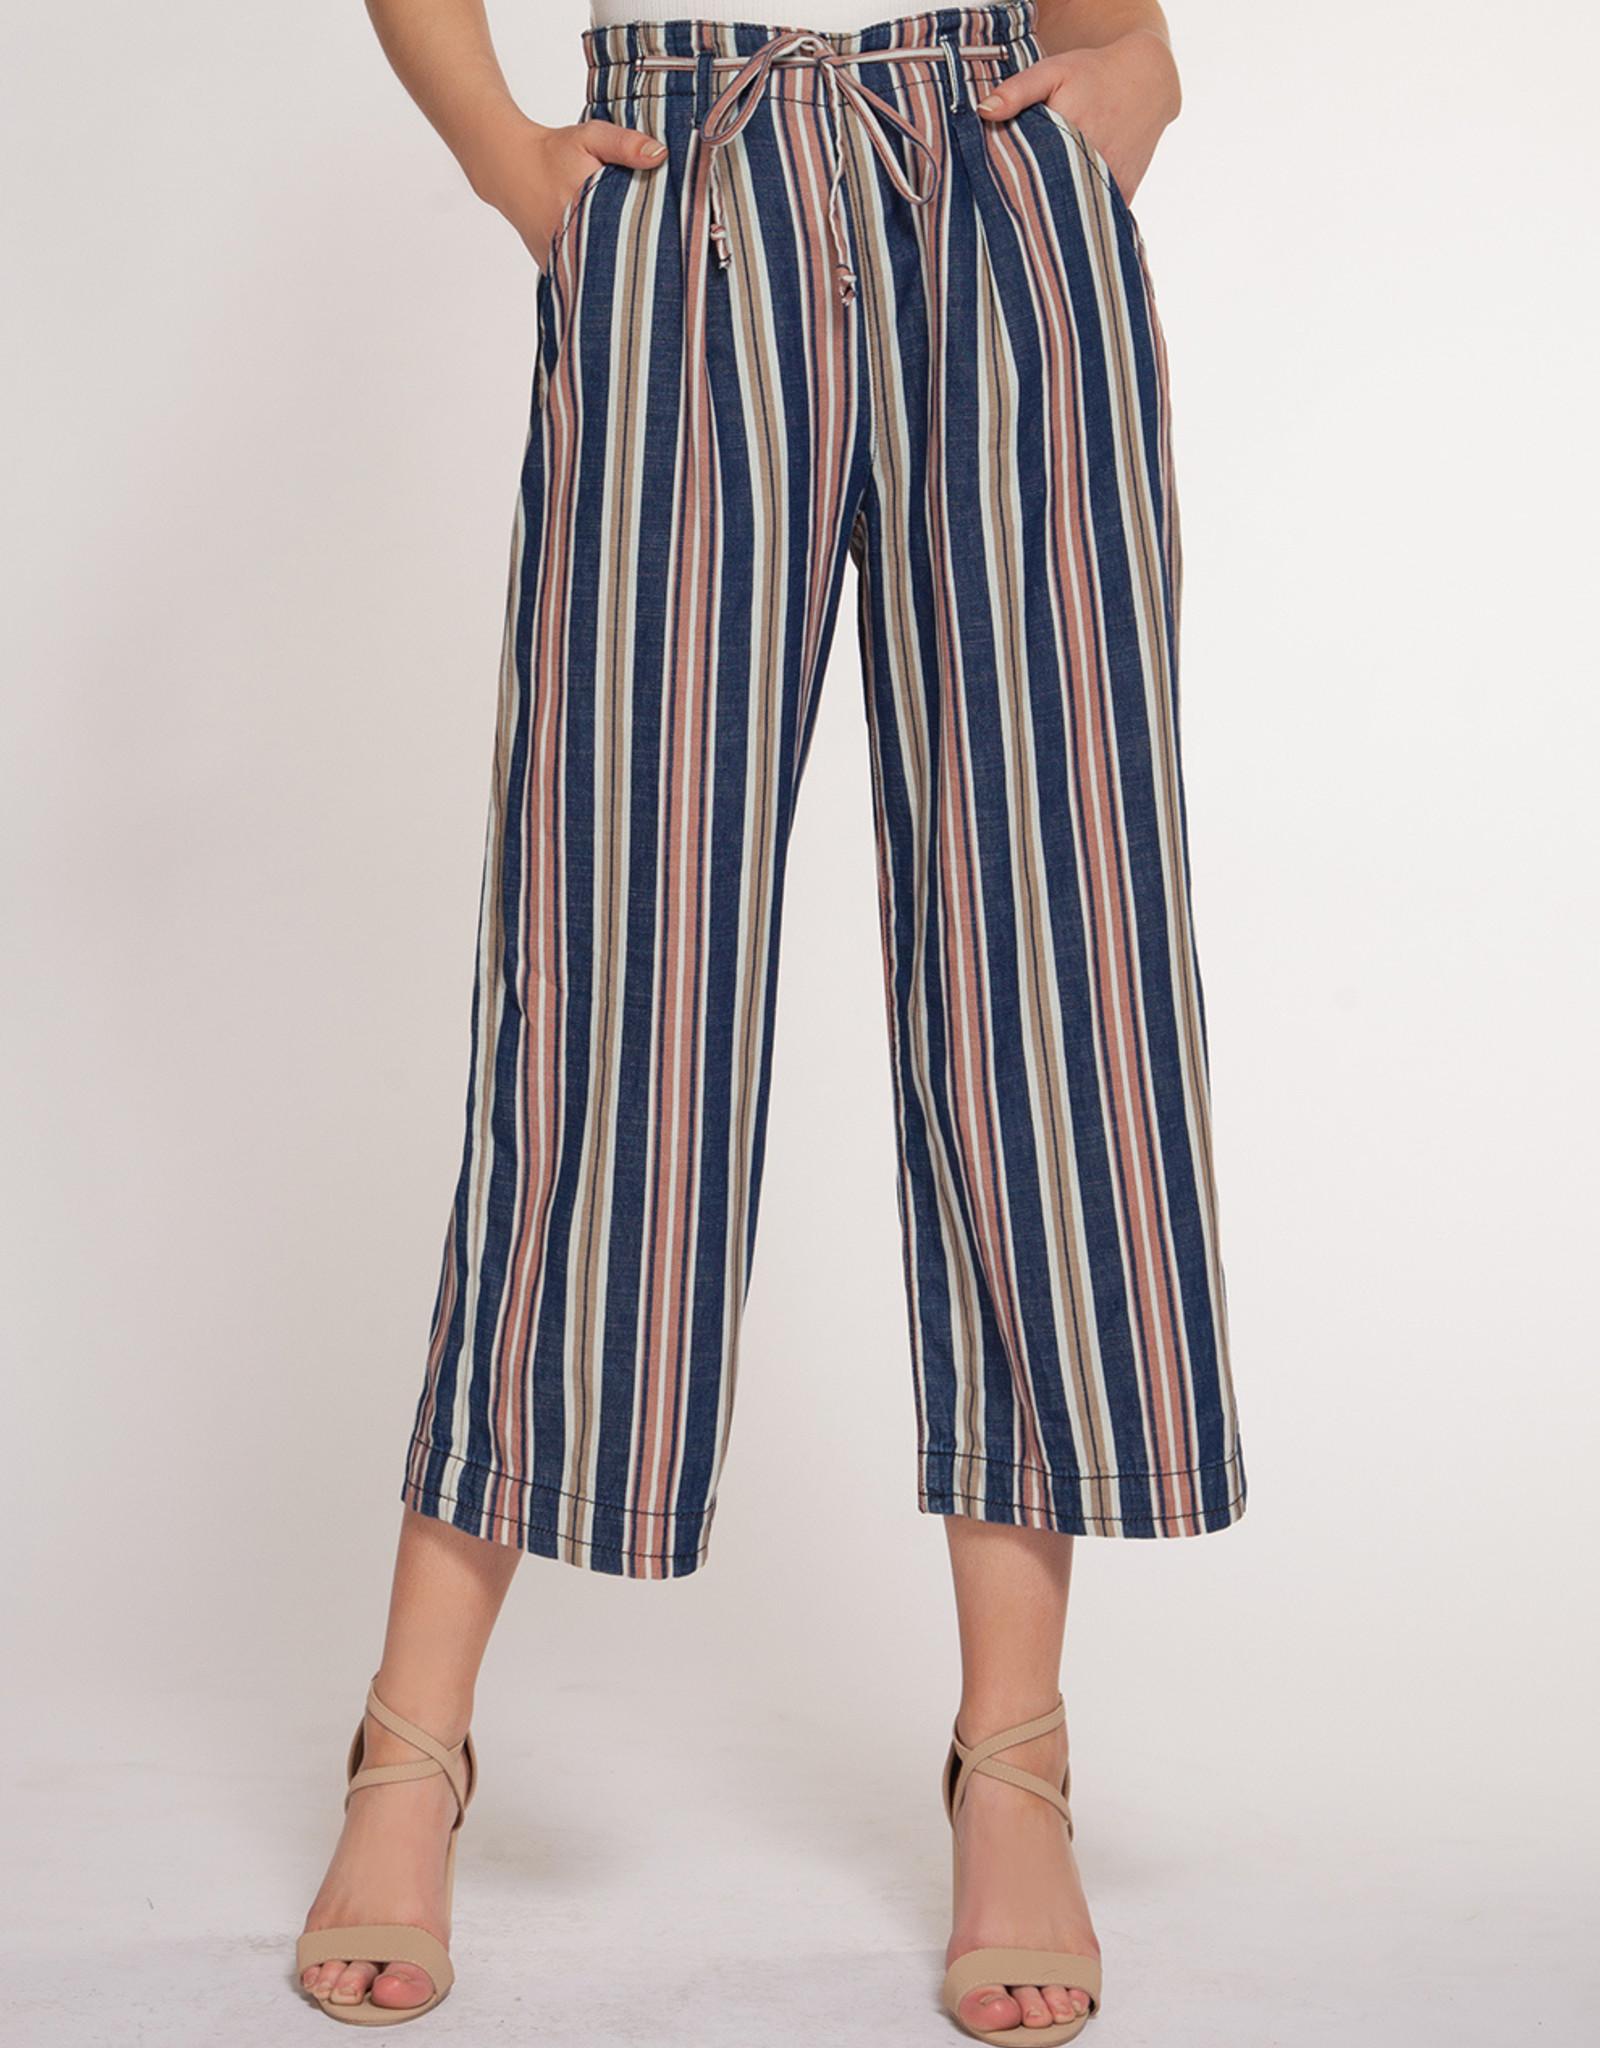 Dex Blue/Blush Stripe Pant